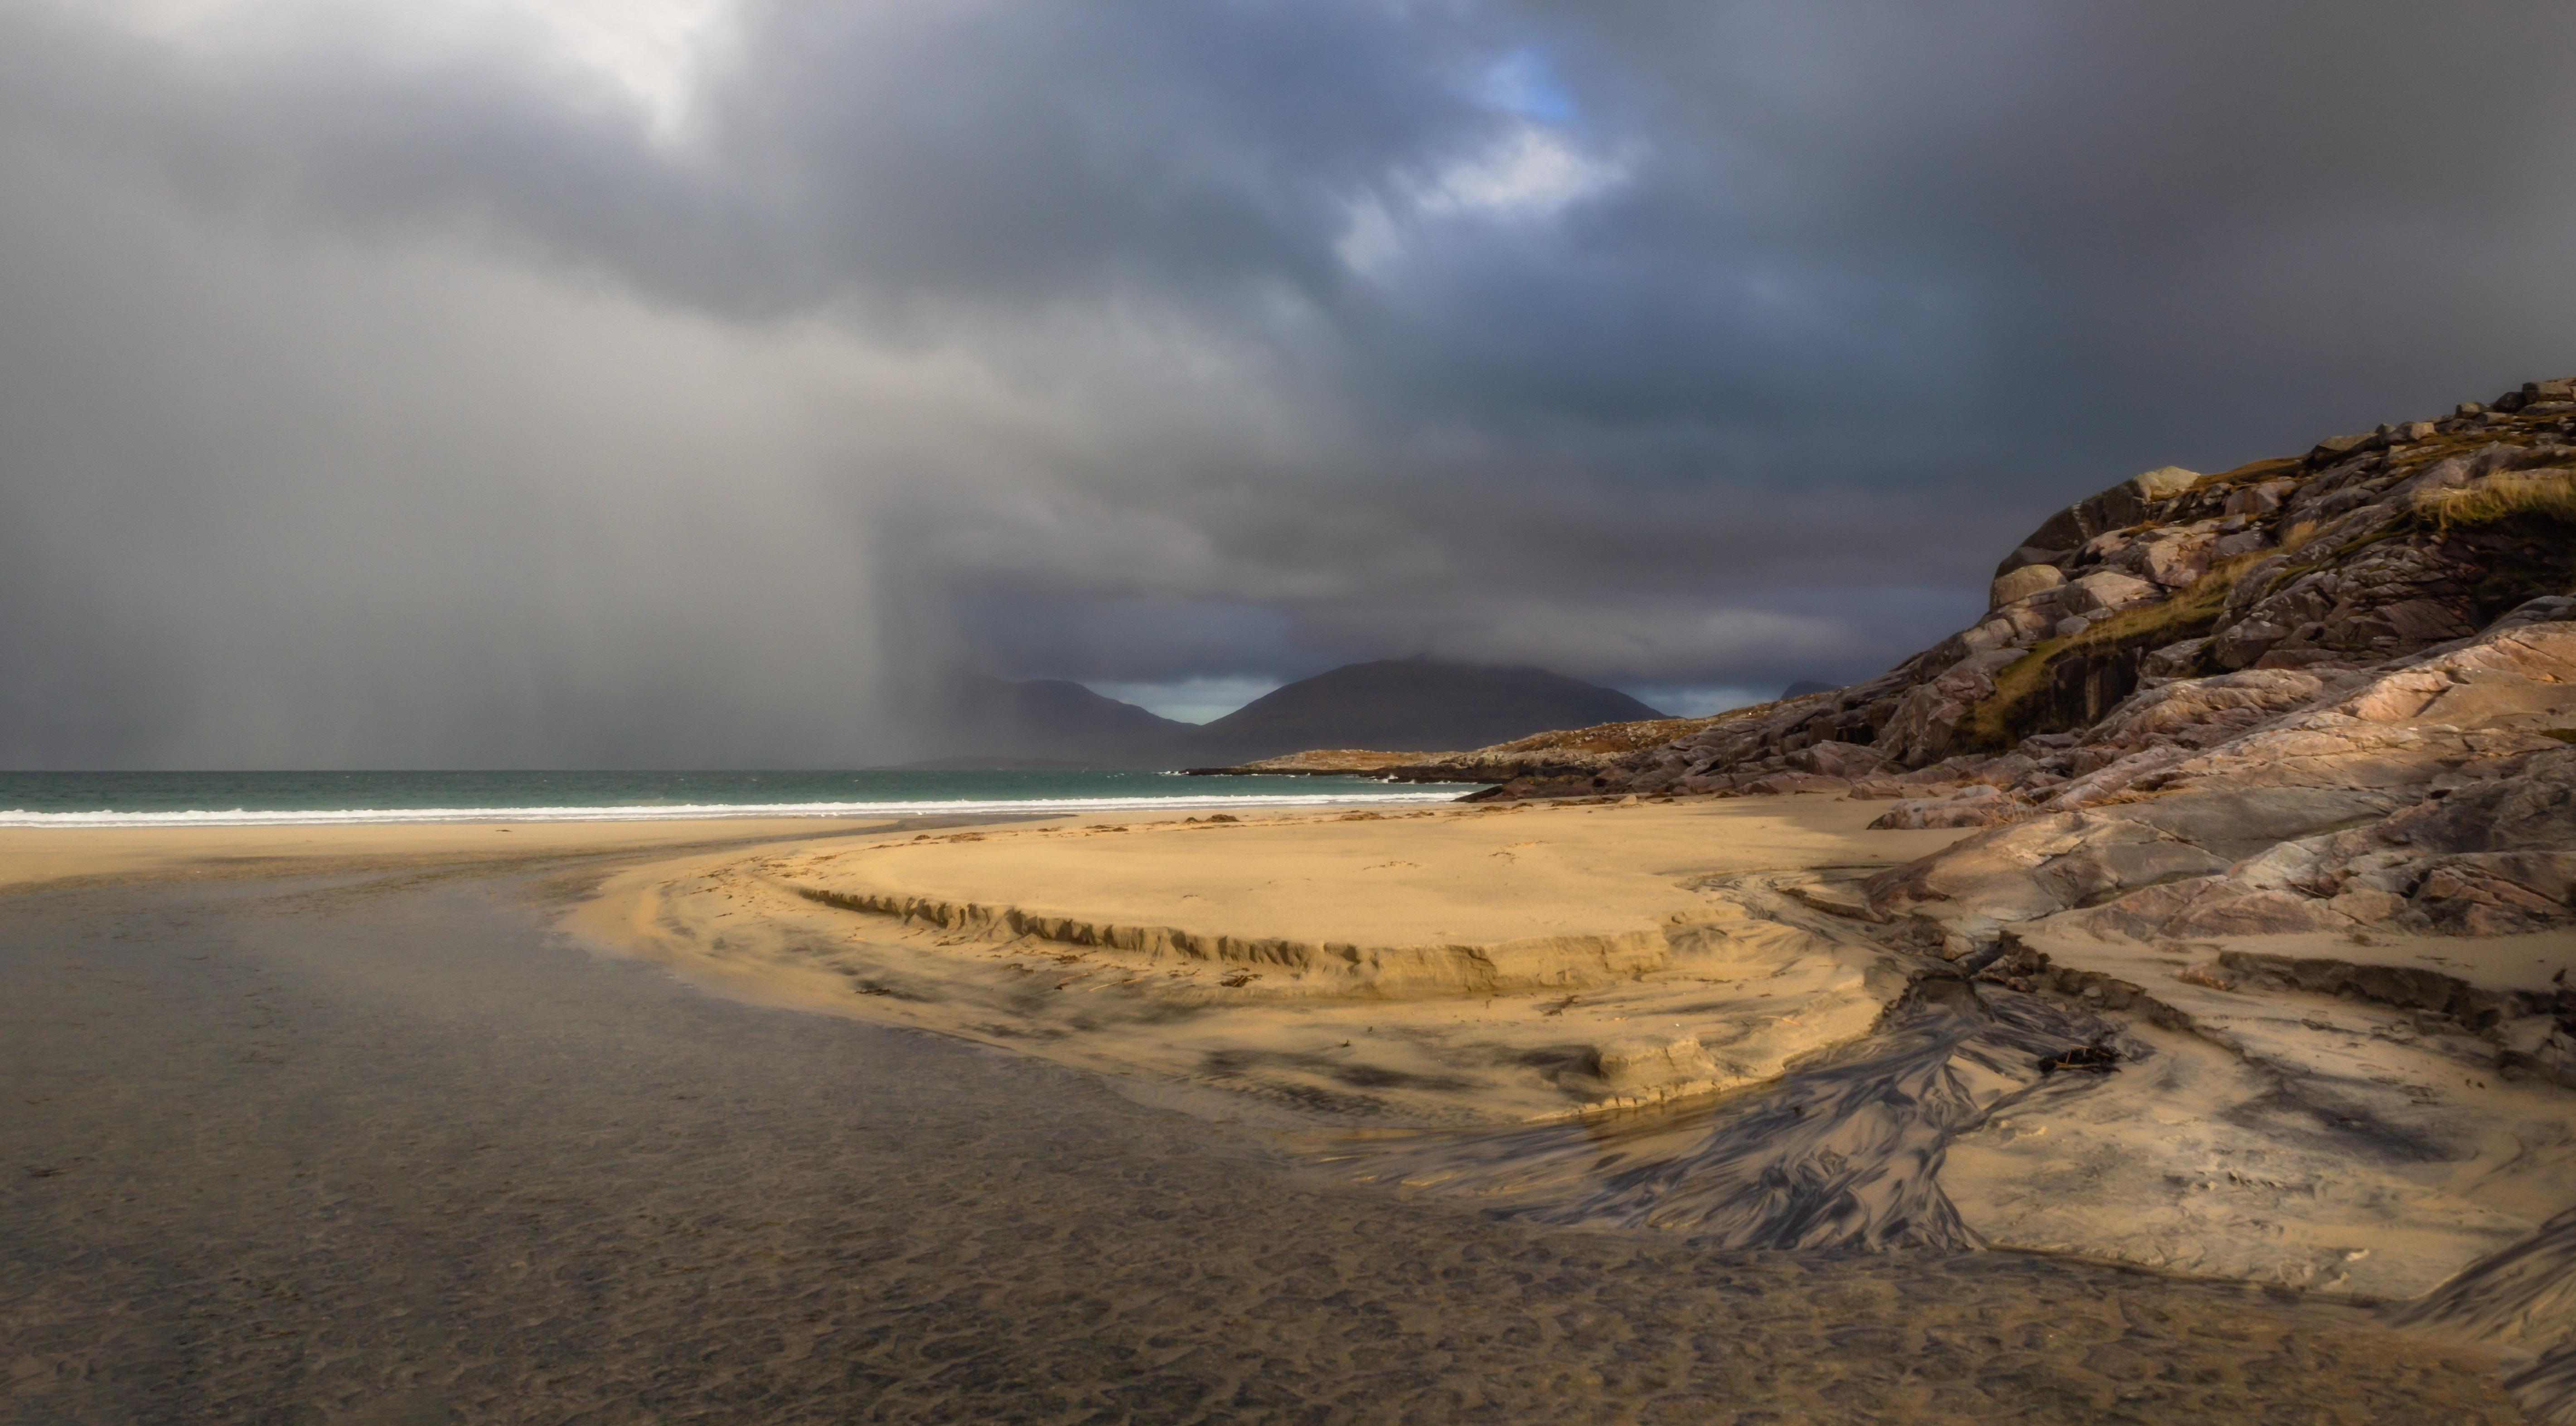 Losgaintir, storm approaching